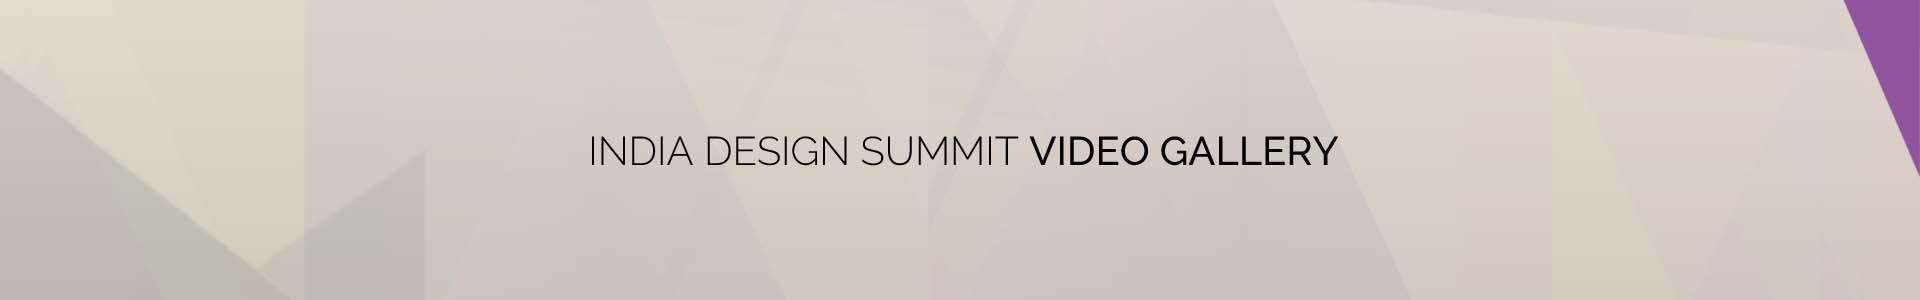 summit-video-gallery